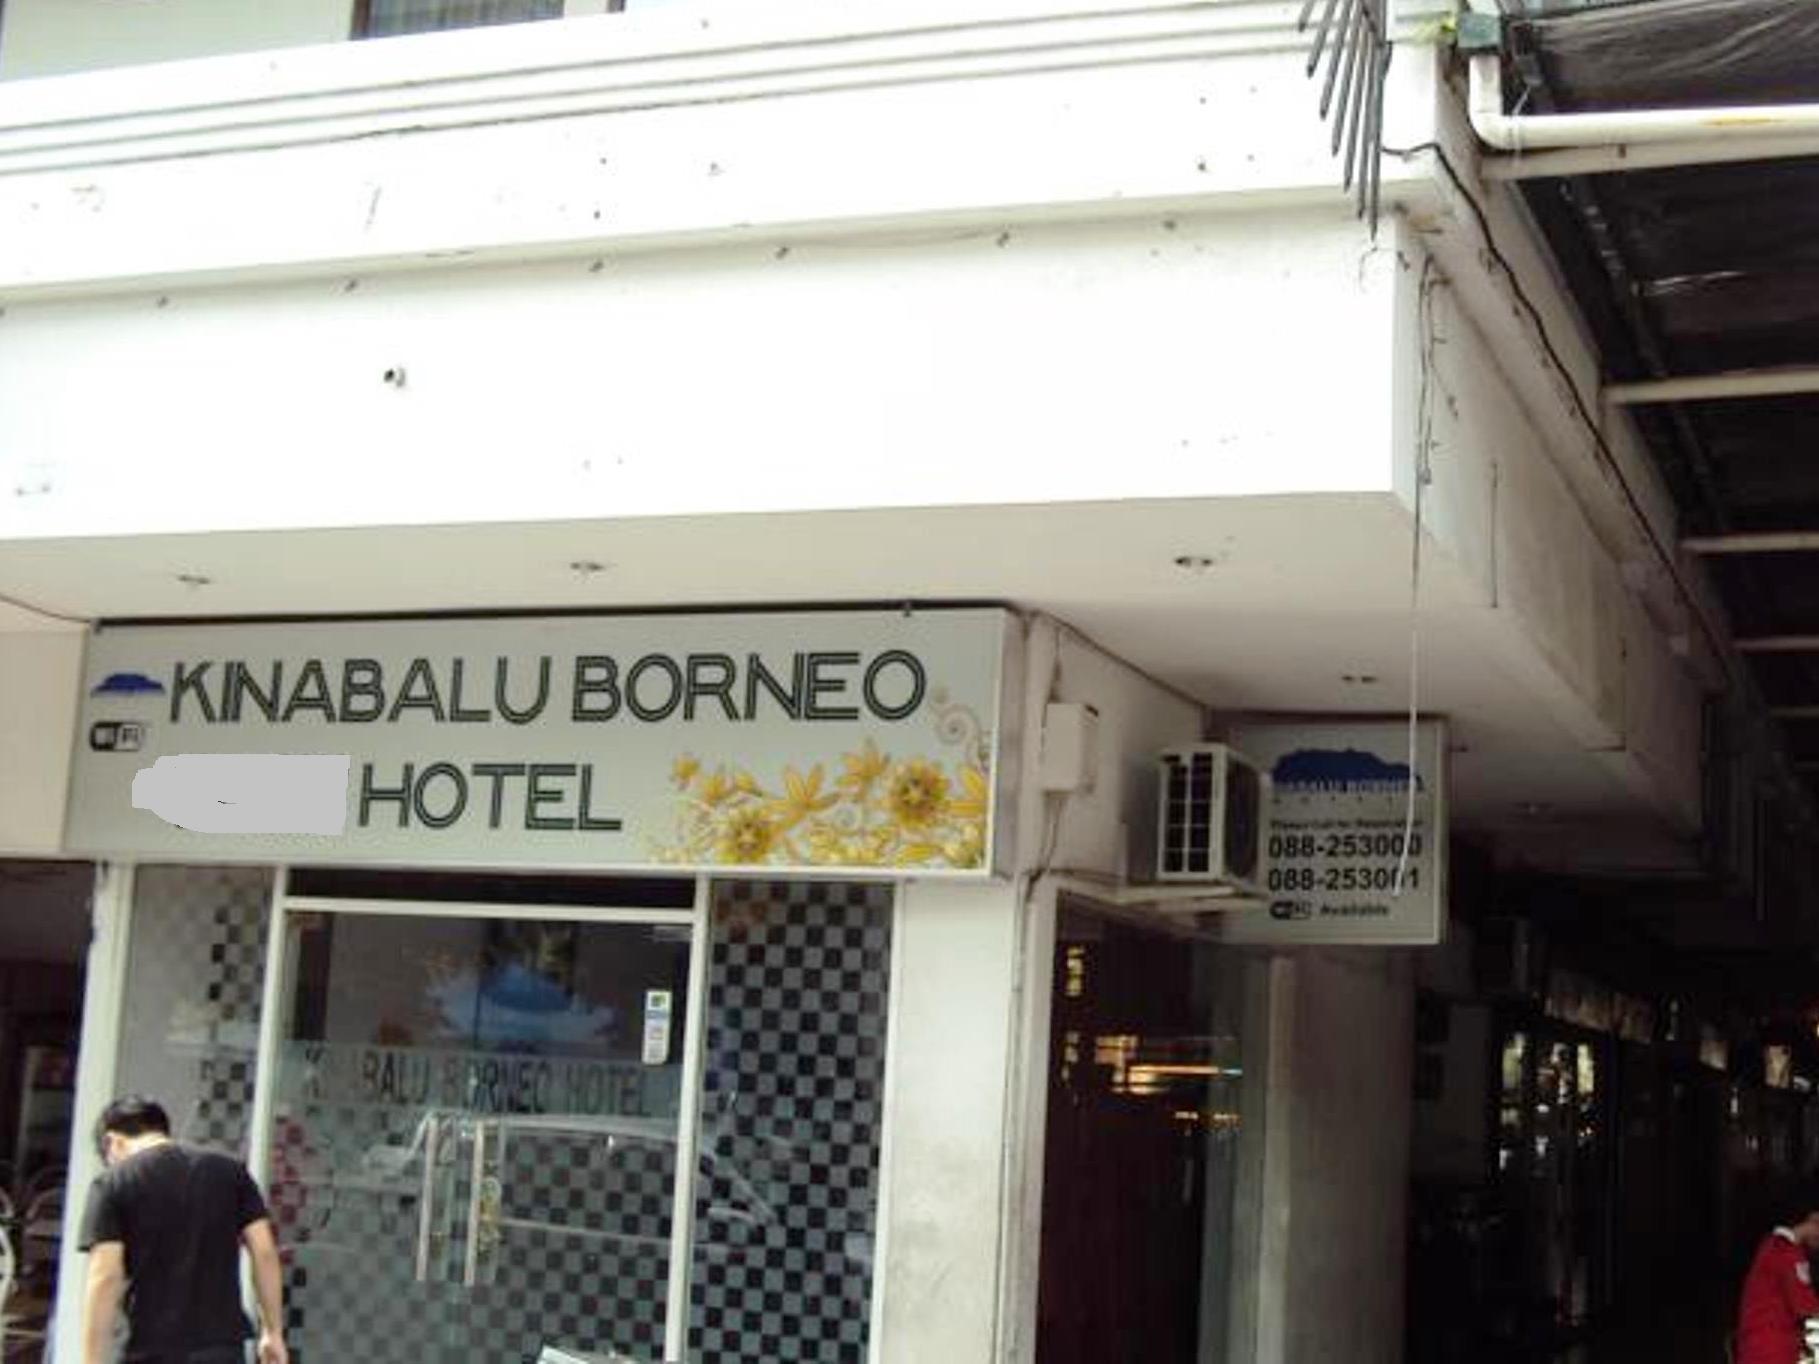 Kinabalu Borneo Hotel Kota Kinabalu - Hotel Exterior